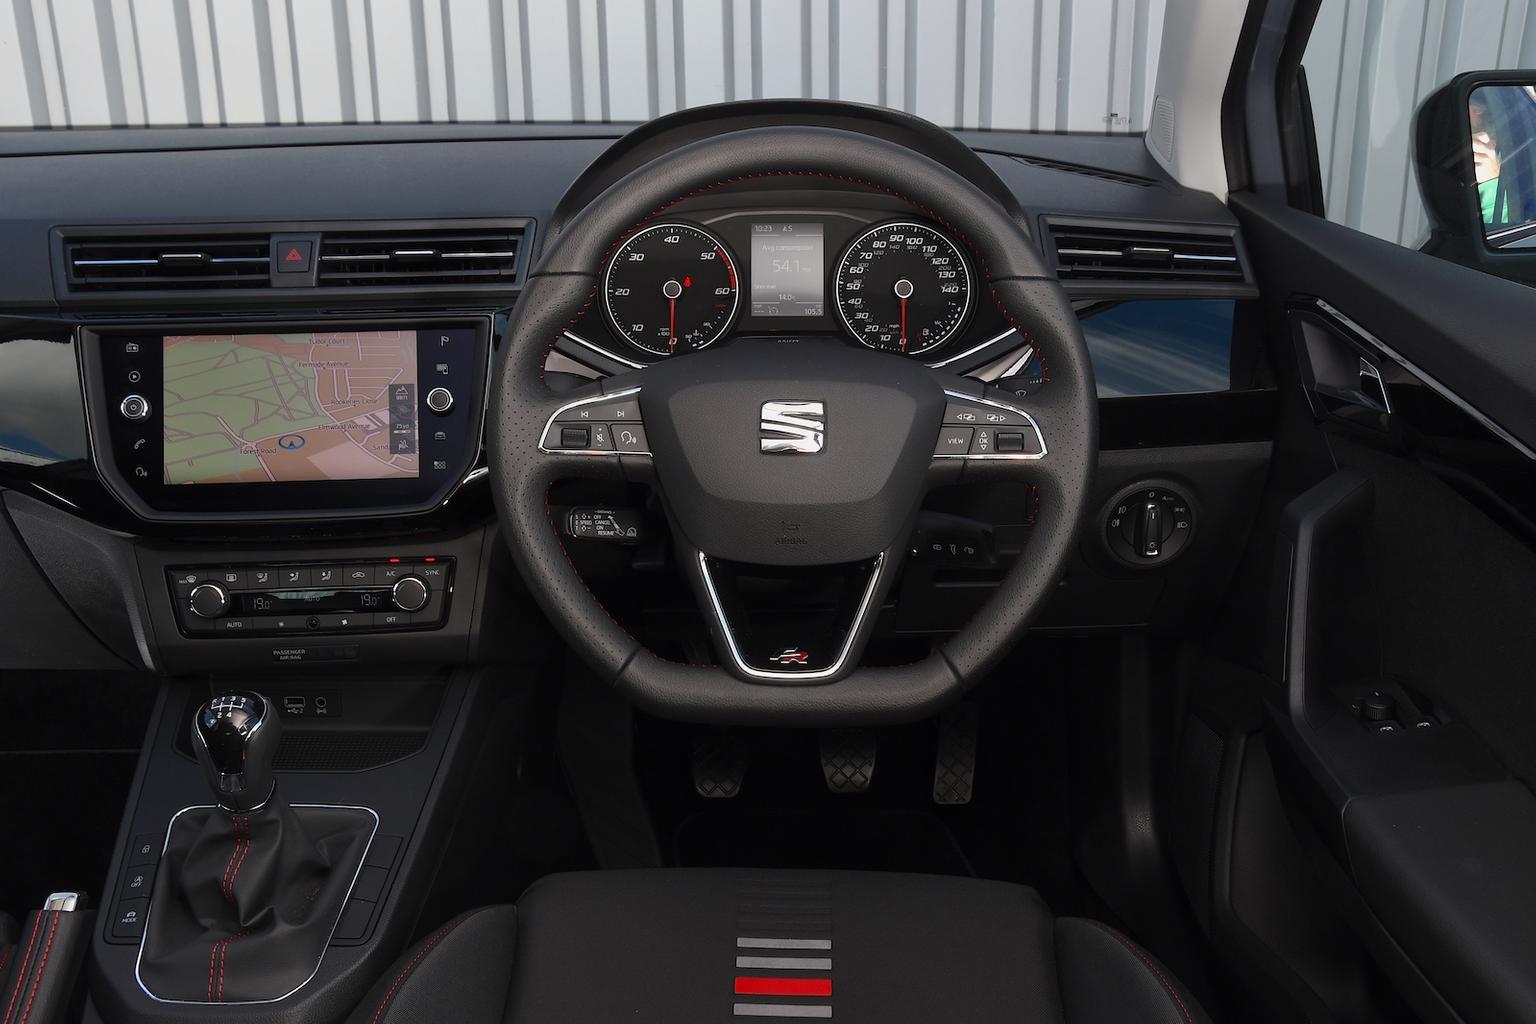 2018 Seat Ibiza 1.6 TDI 95 review – price, specs, release date